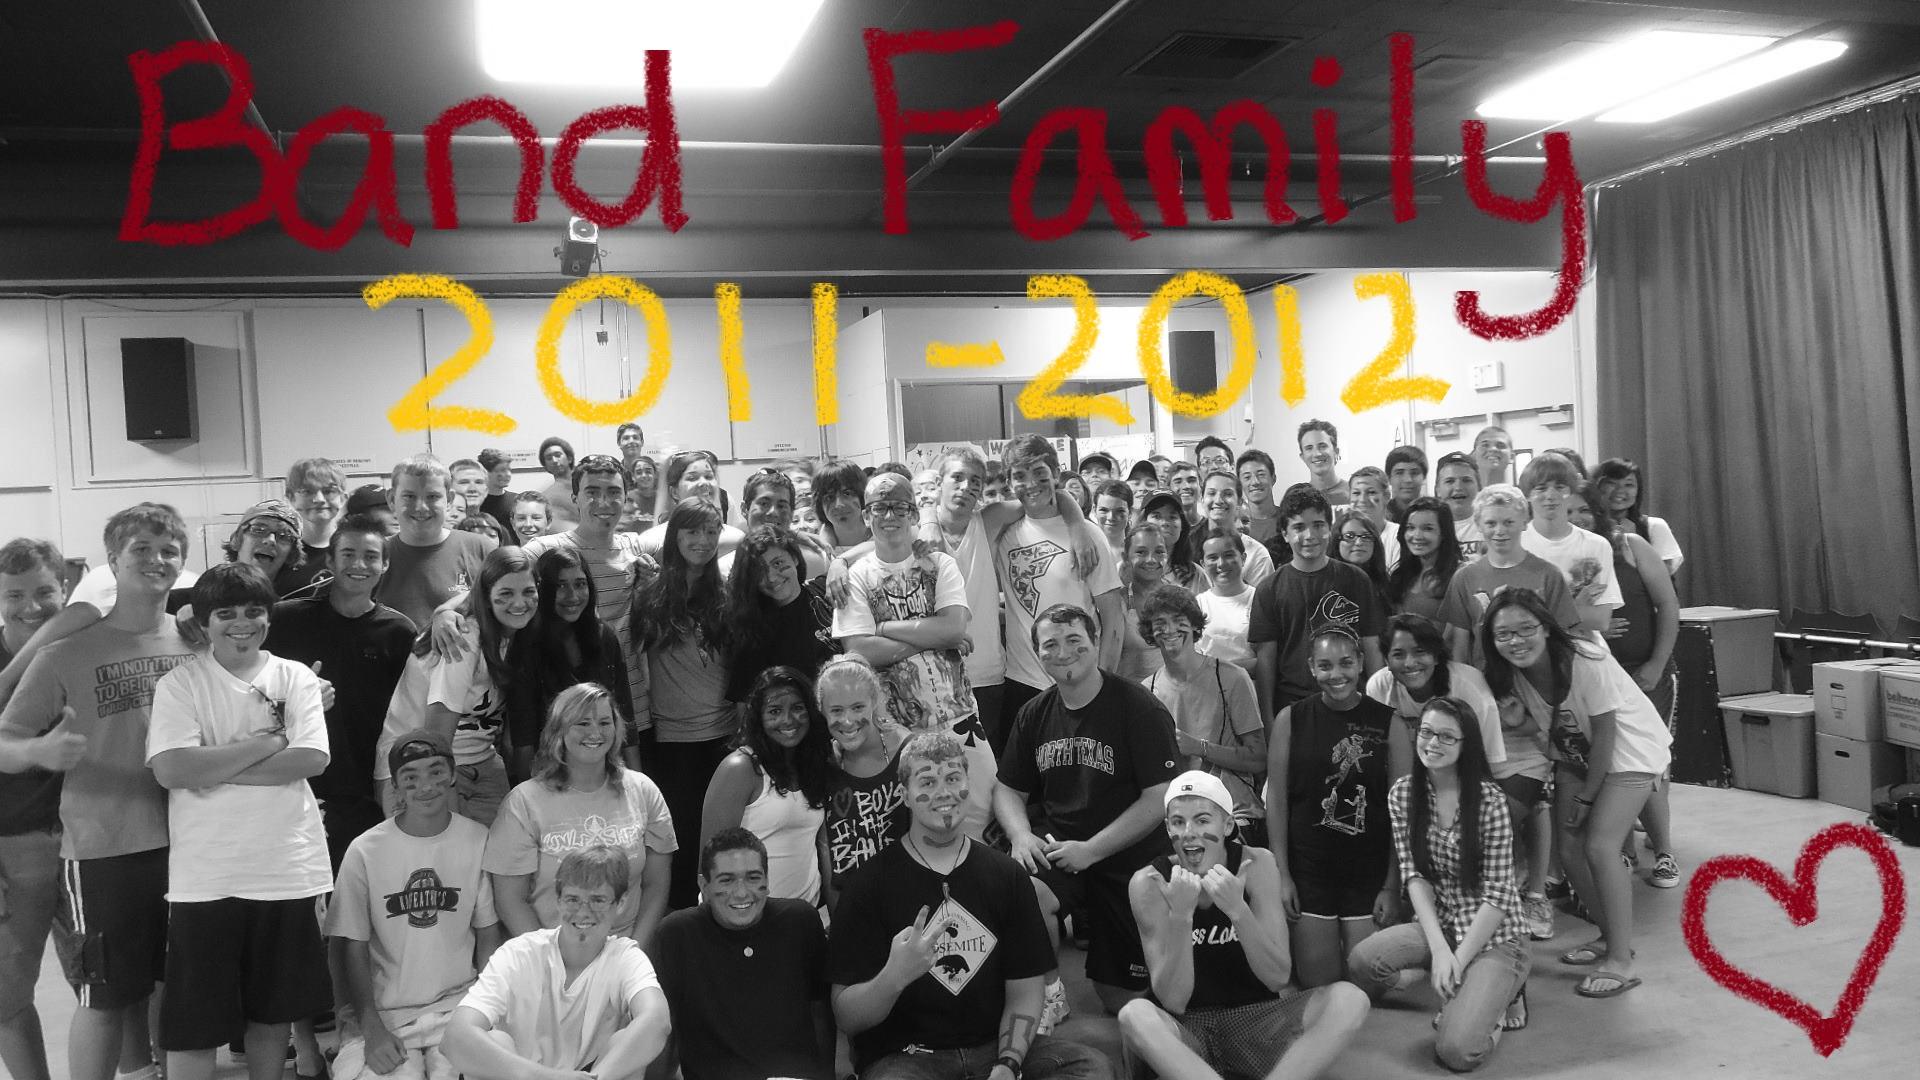 ehs-band-camp-2011-bw-edit